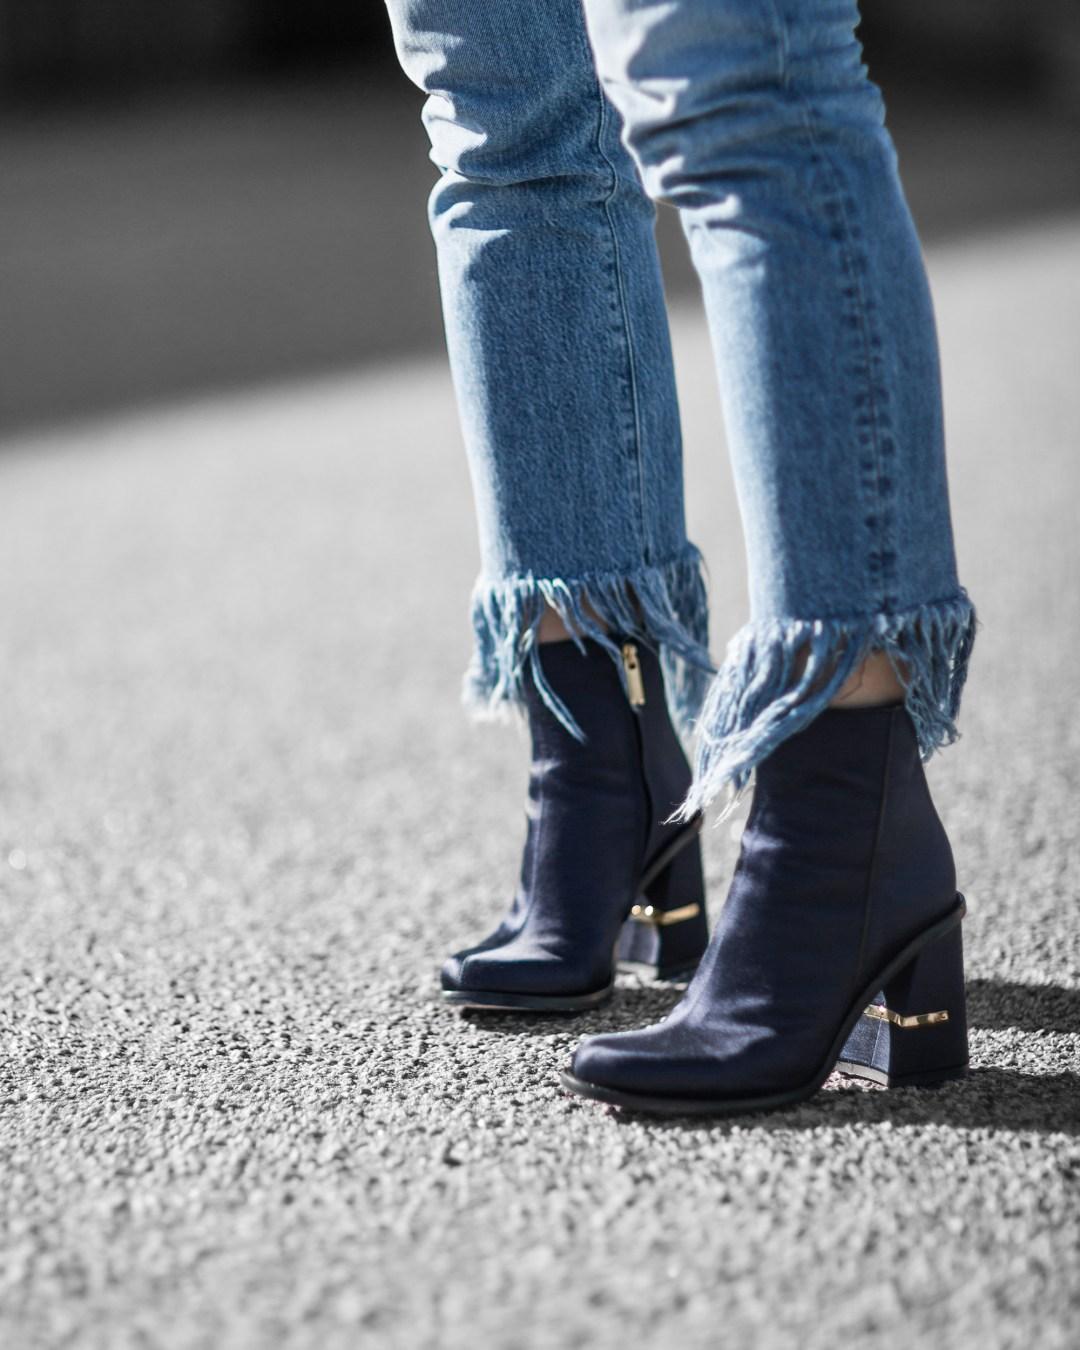 Tibi boots chloe faye 3x1 frayed jeans long sleeve shirt outfit inspiration 05